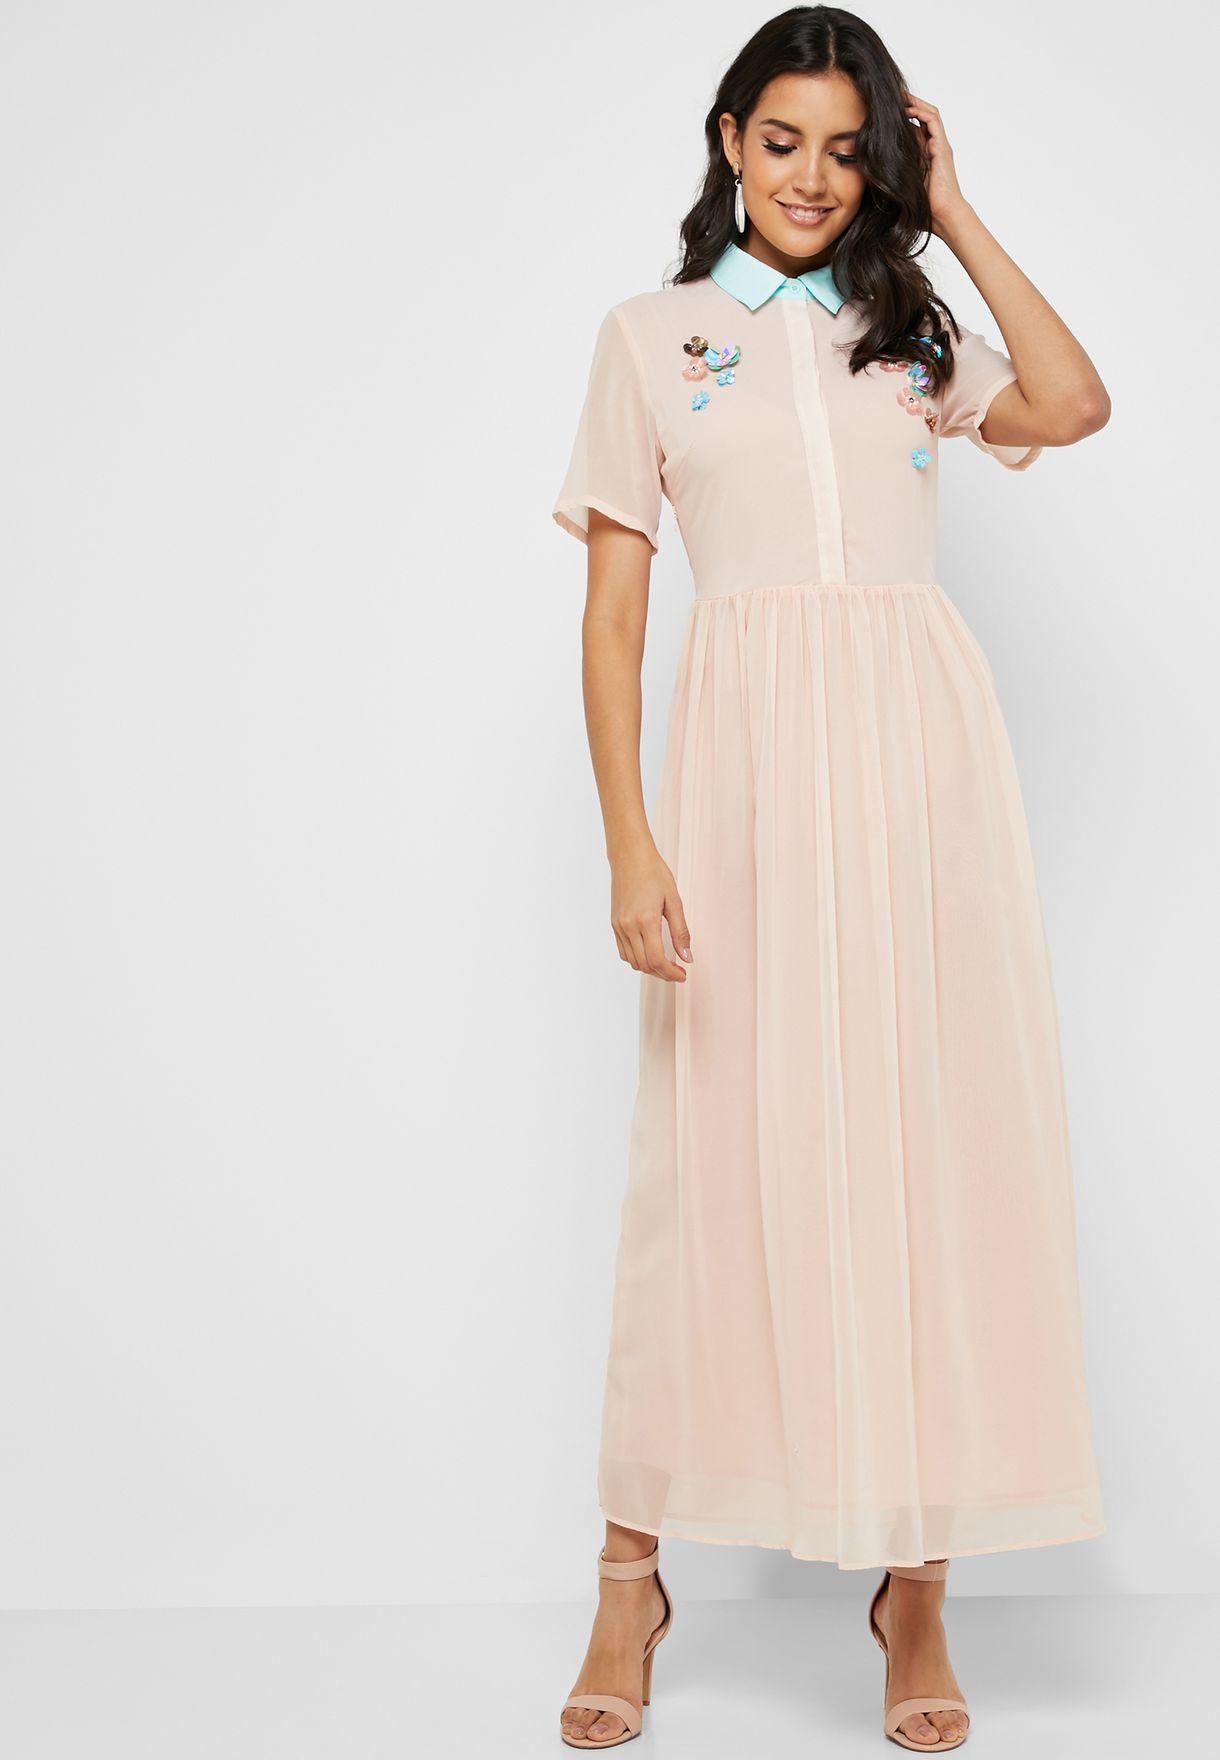 Floral Applique Collared Dress